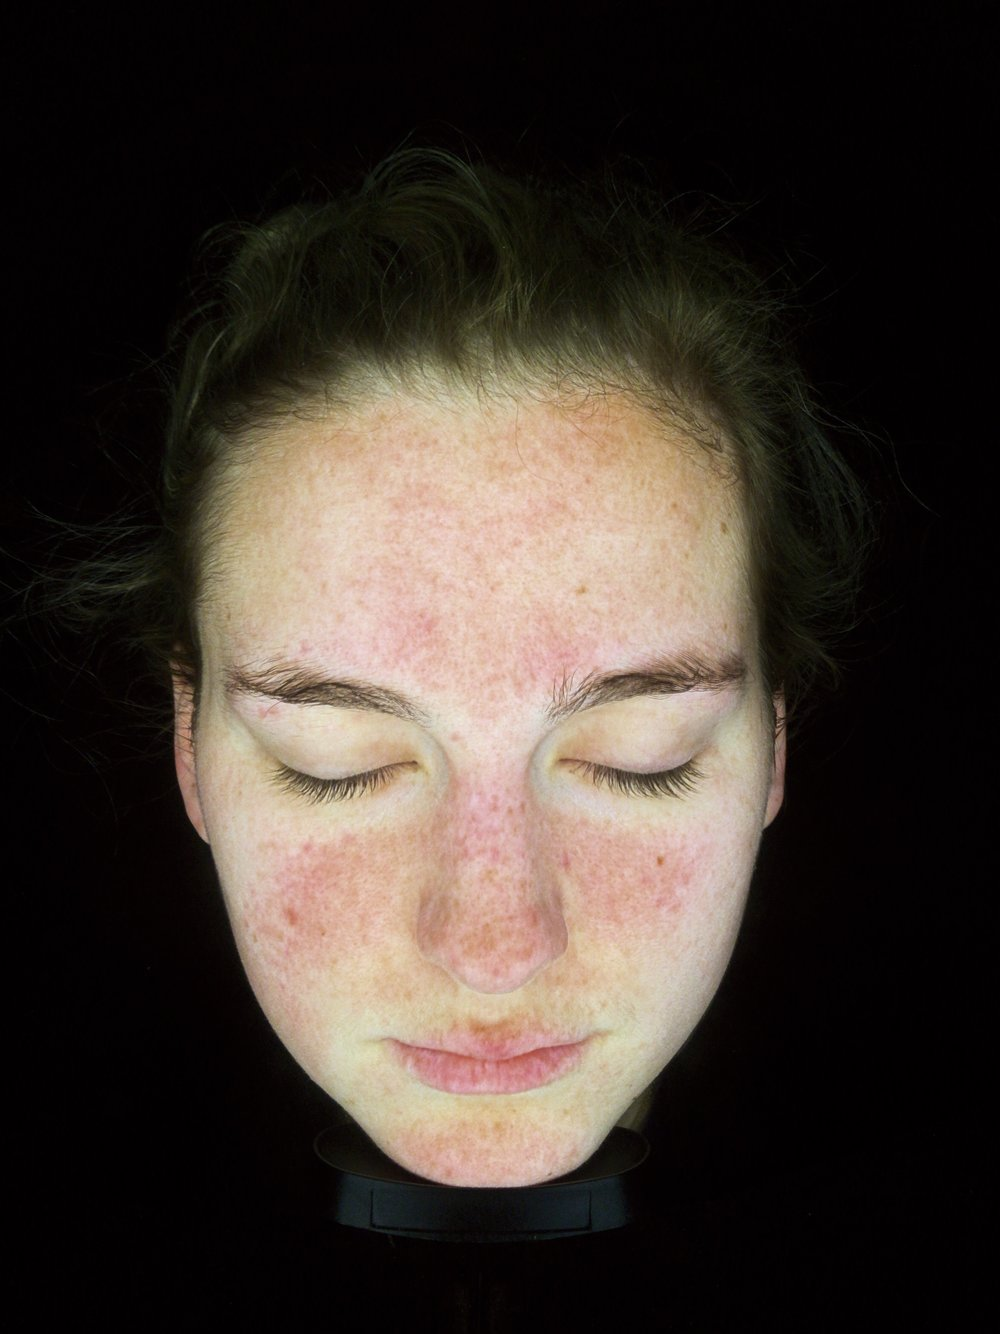 Pigmentation, above the upper lip